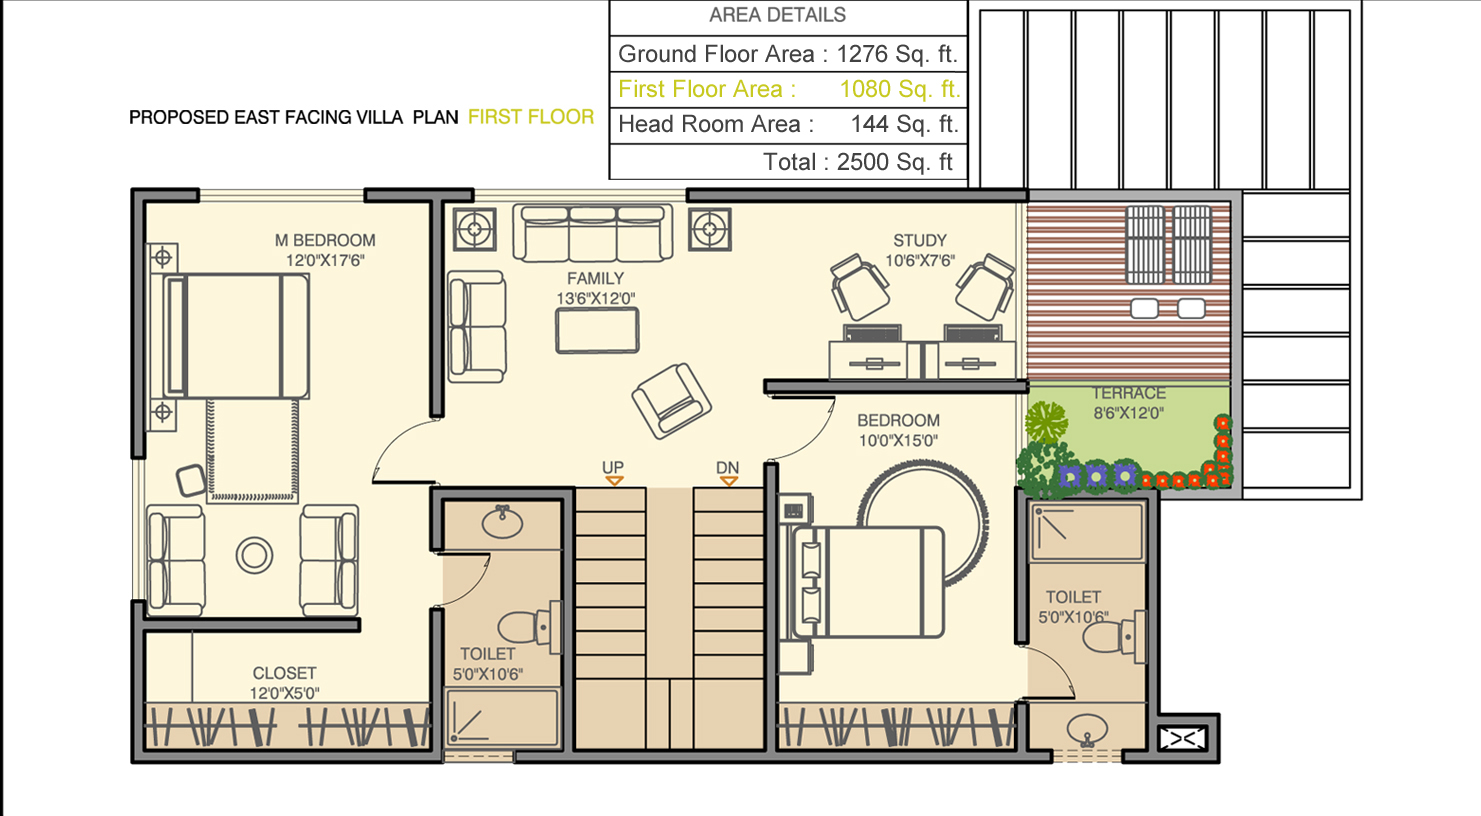 First Floor Plan For North Facing House VarusbattleFloor